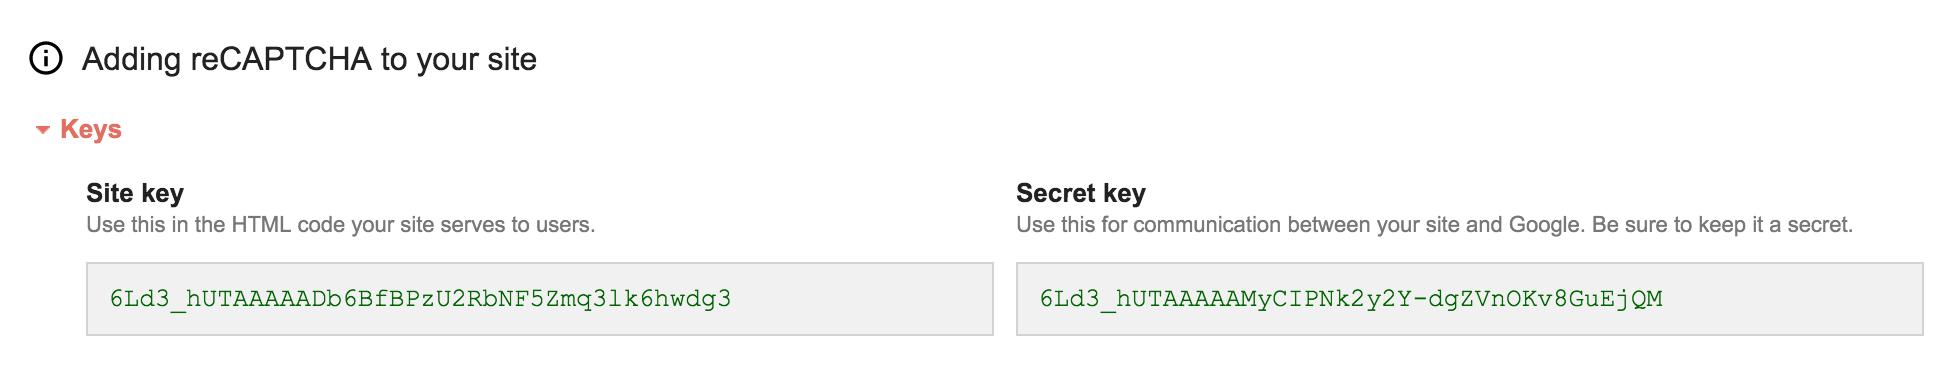 wpuf - reCAPTCHA site and secret key